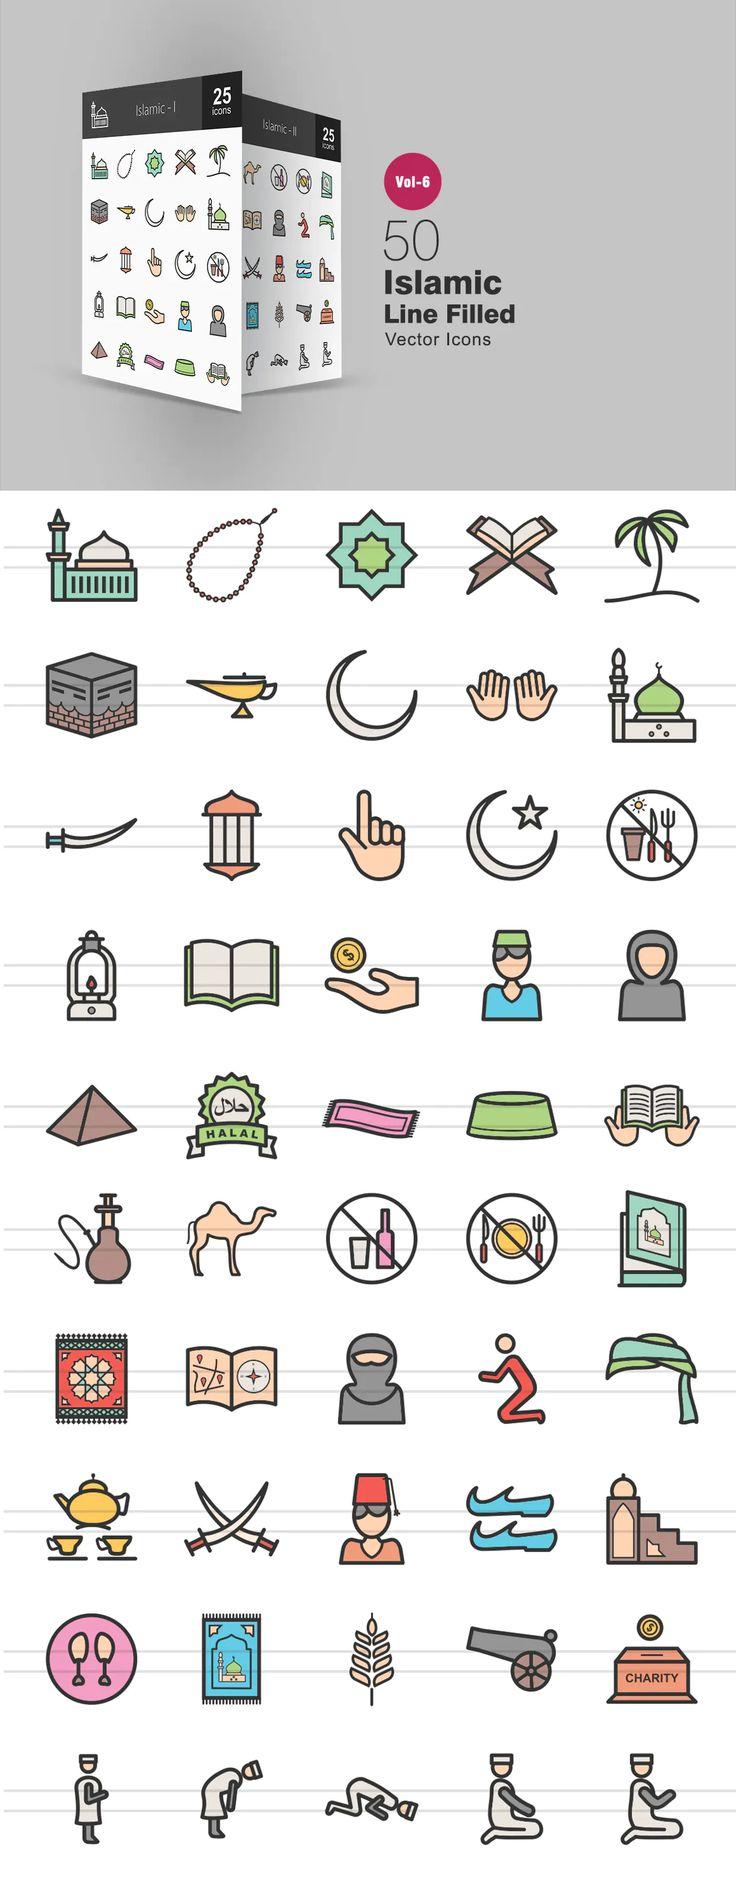 50 Islamic Filled Line Icons AI, EPS di 2020 Desain